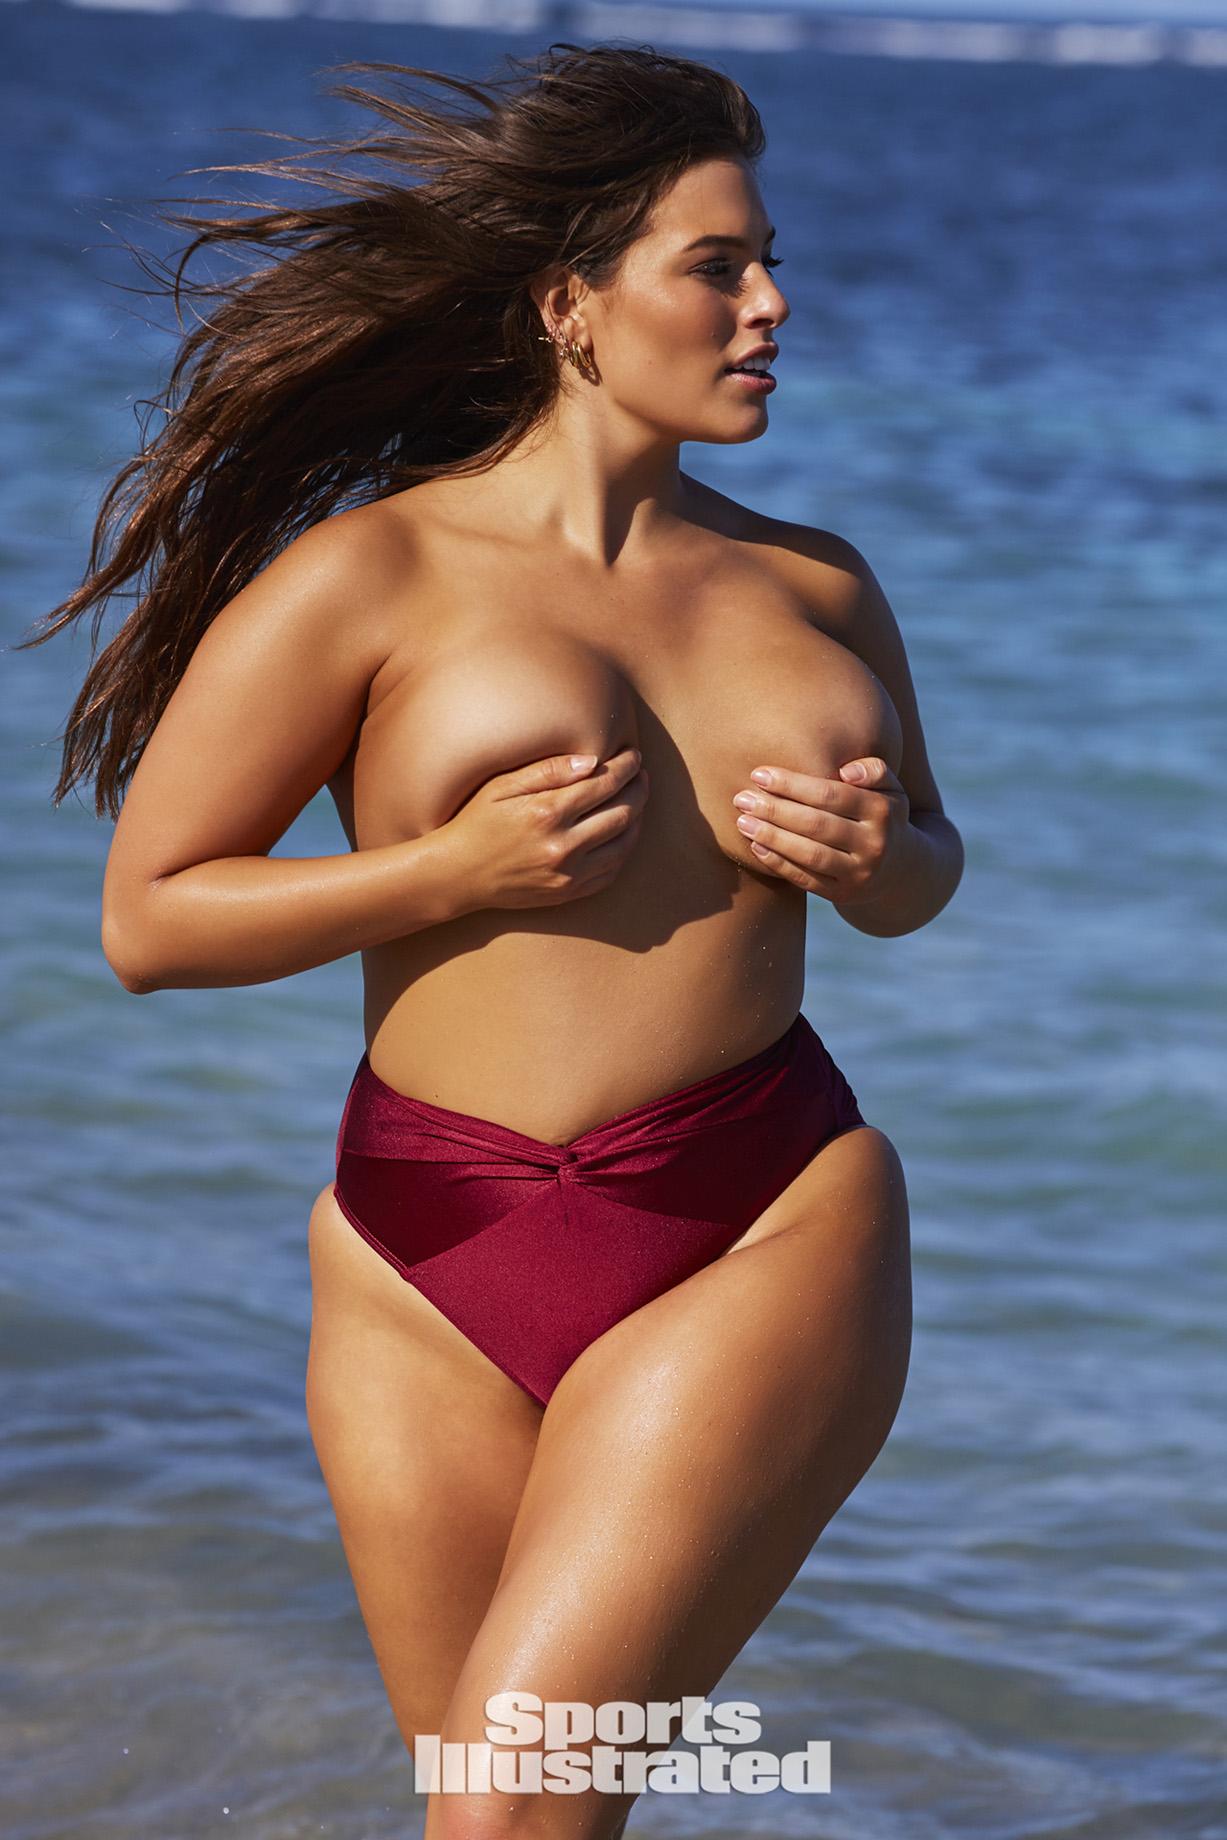 Ashley Graham / Эшли Грэм в купальниках из новой коллекции Sports Illustrated Swimsuit 2018 issue / in Nevis by Josie Clough